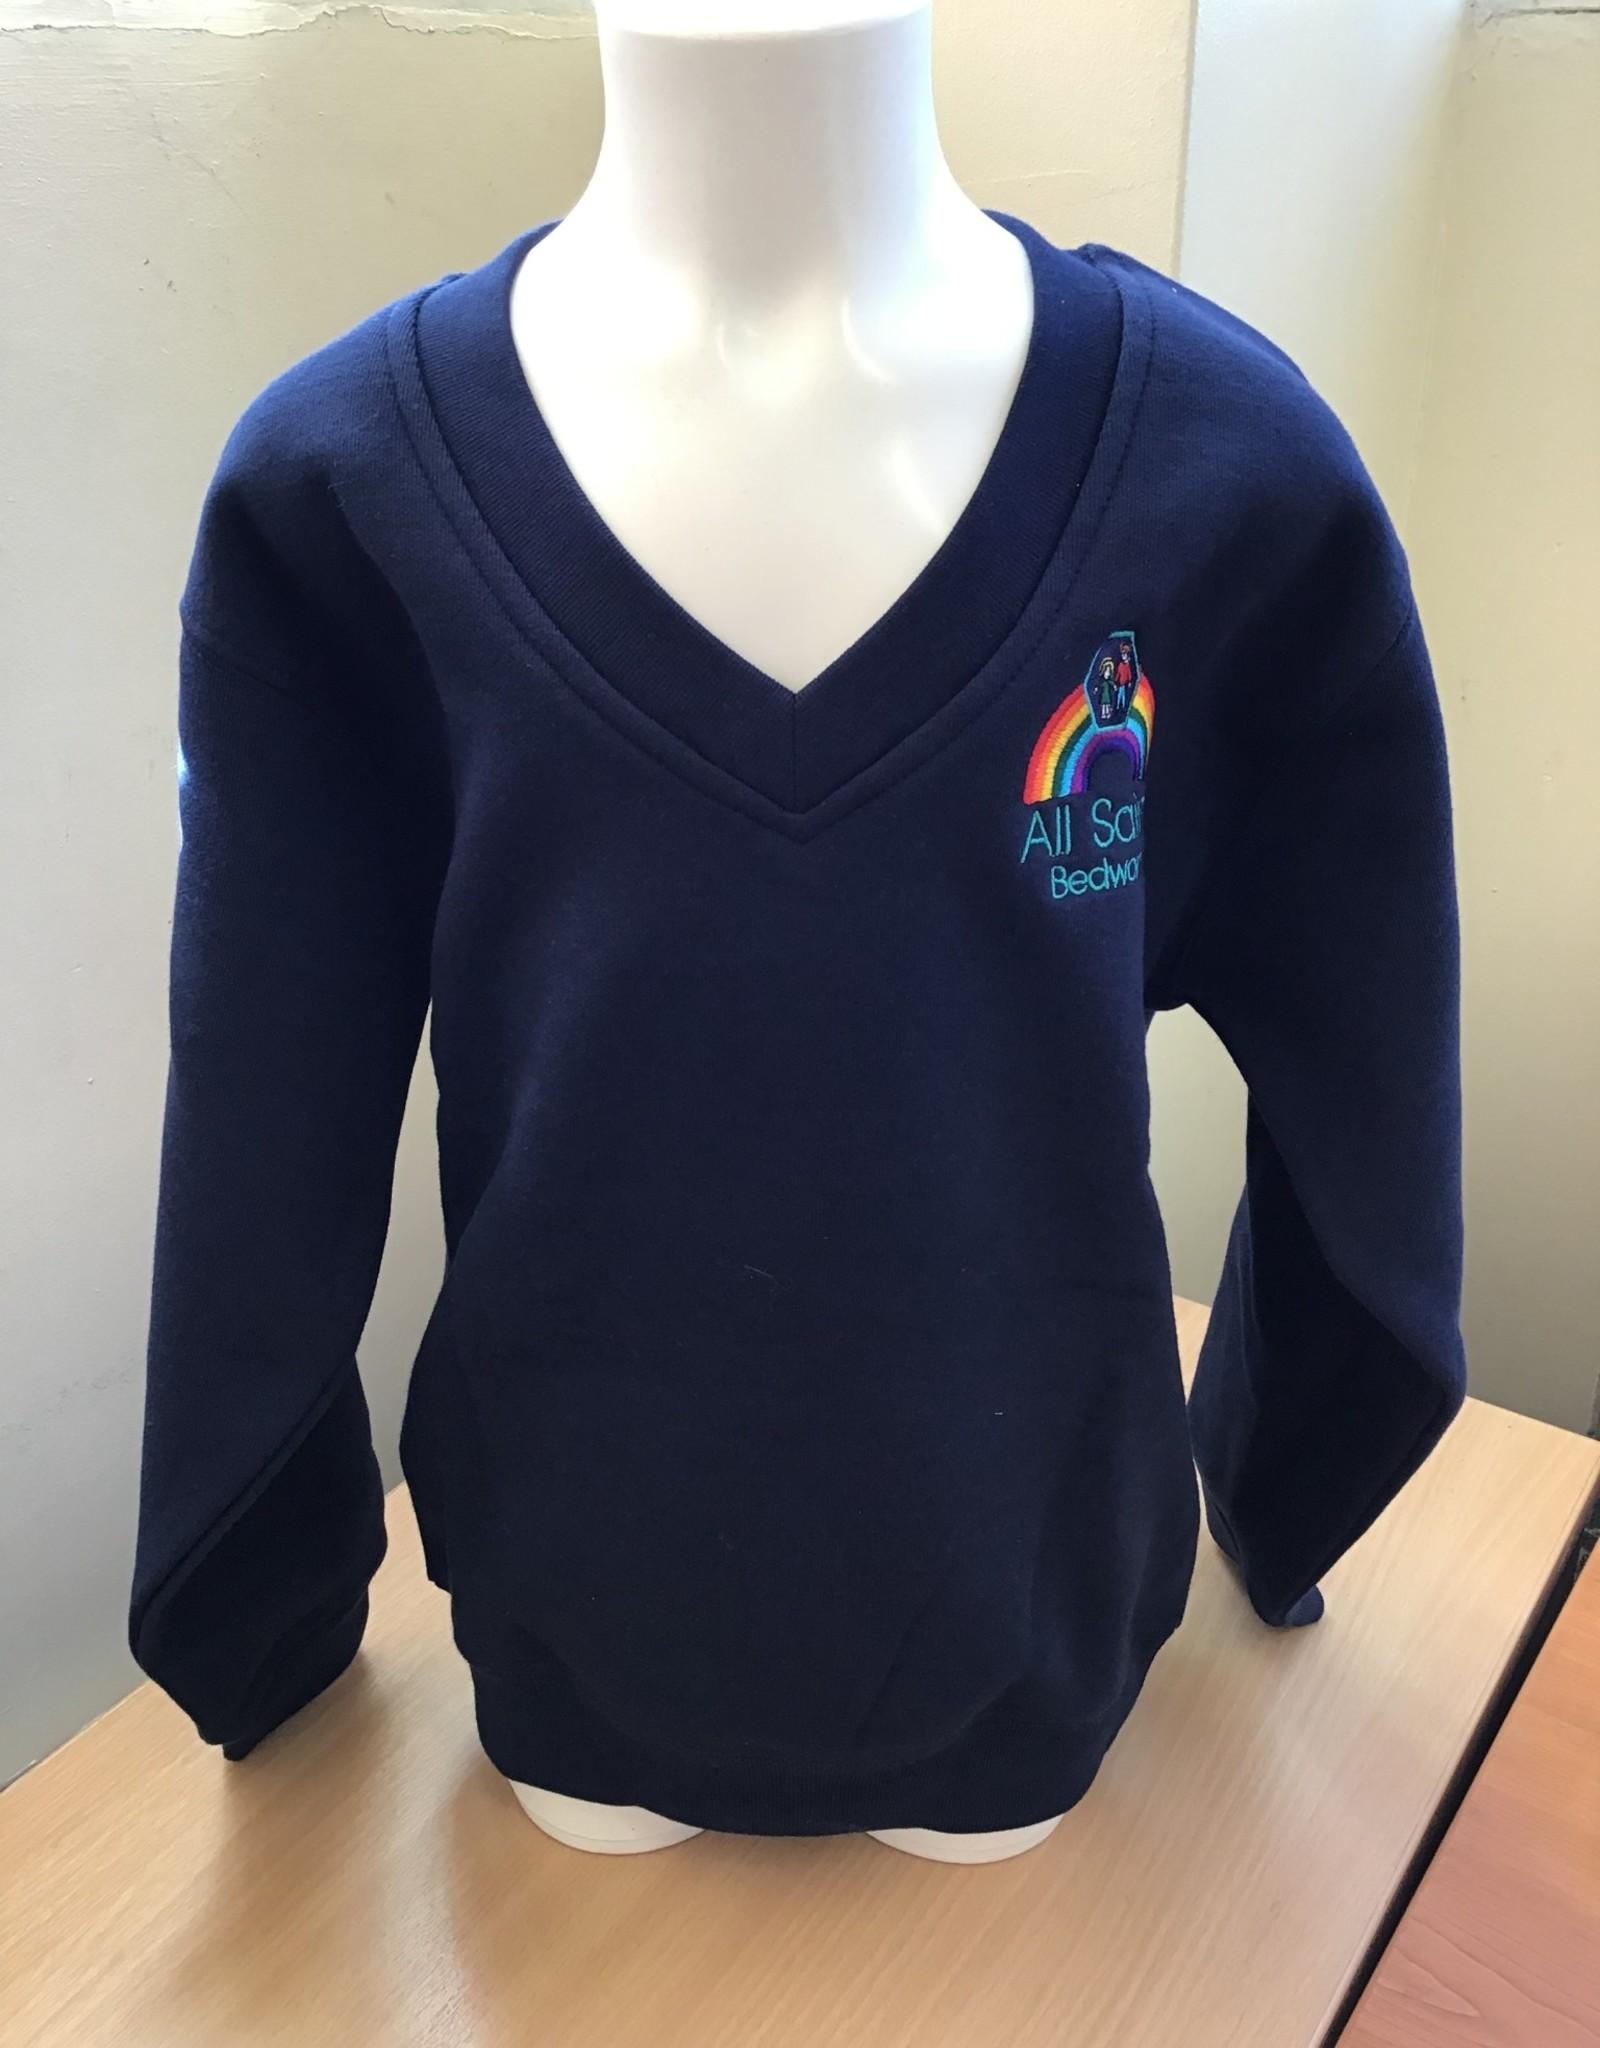 V-Neck Sweatshirt Child Size - All Saints